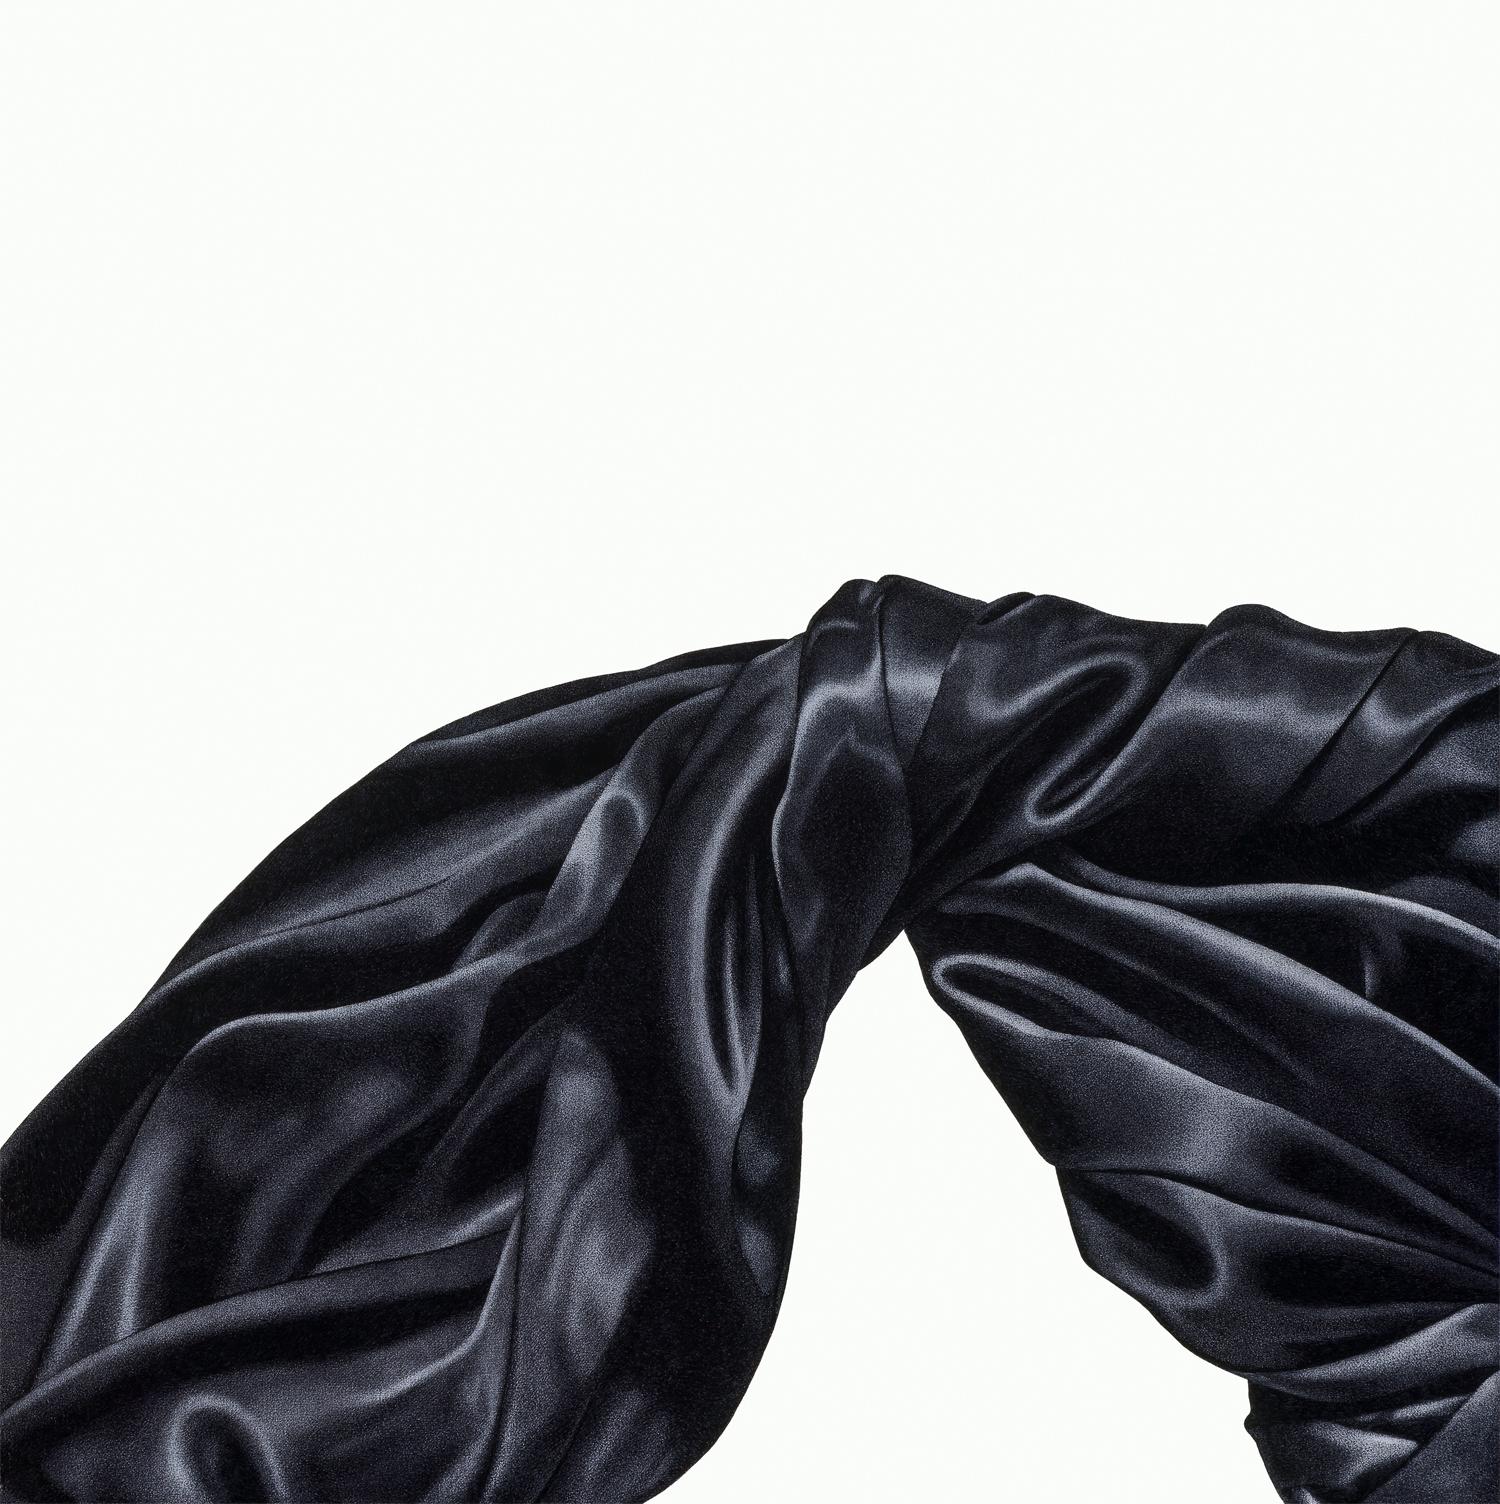 Black Silk (triptych), Panel III